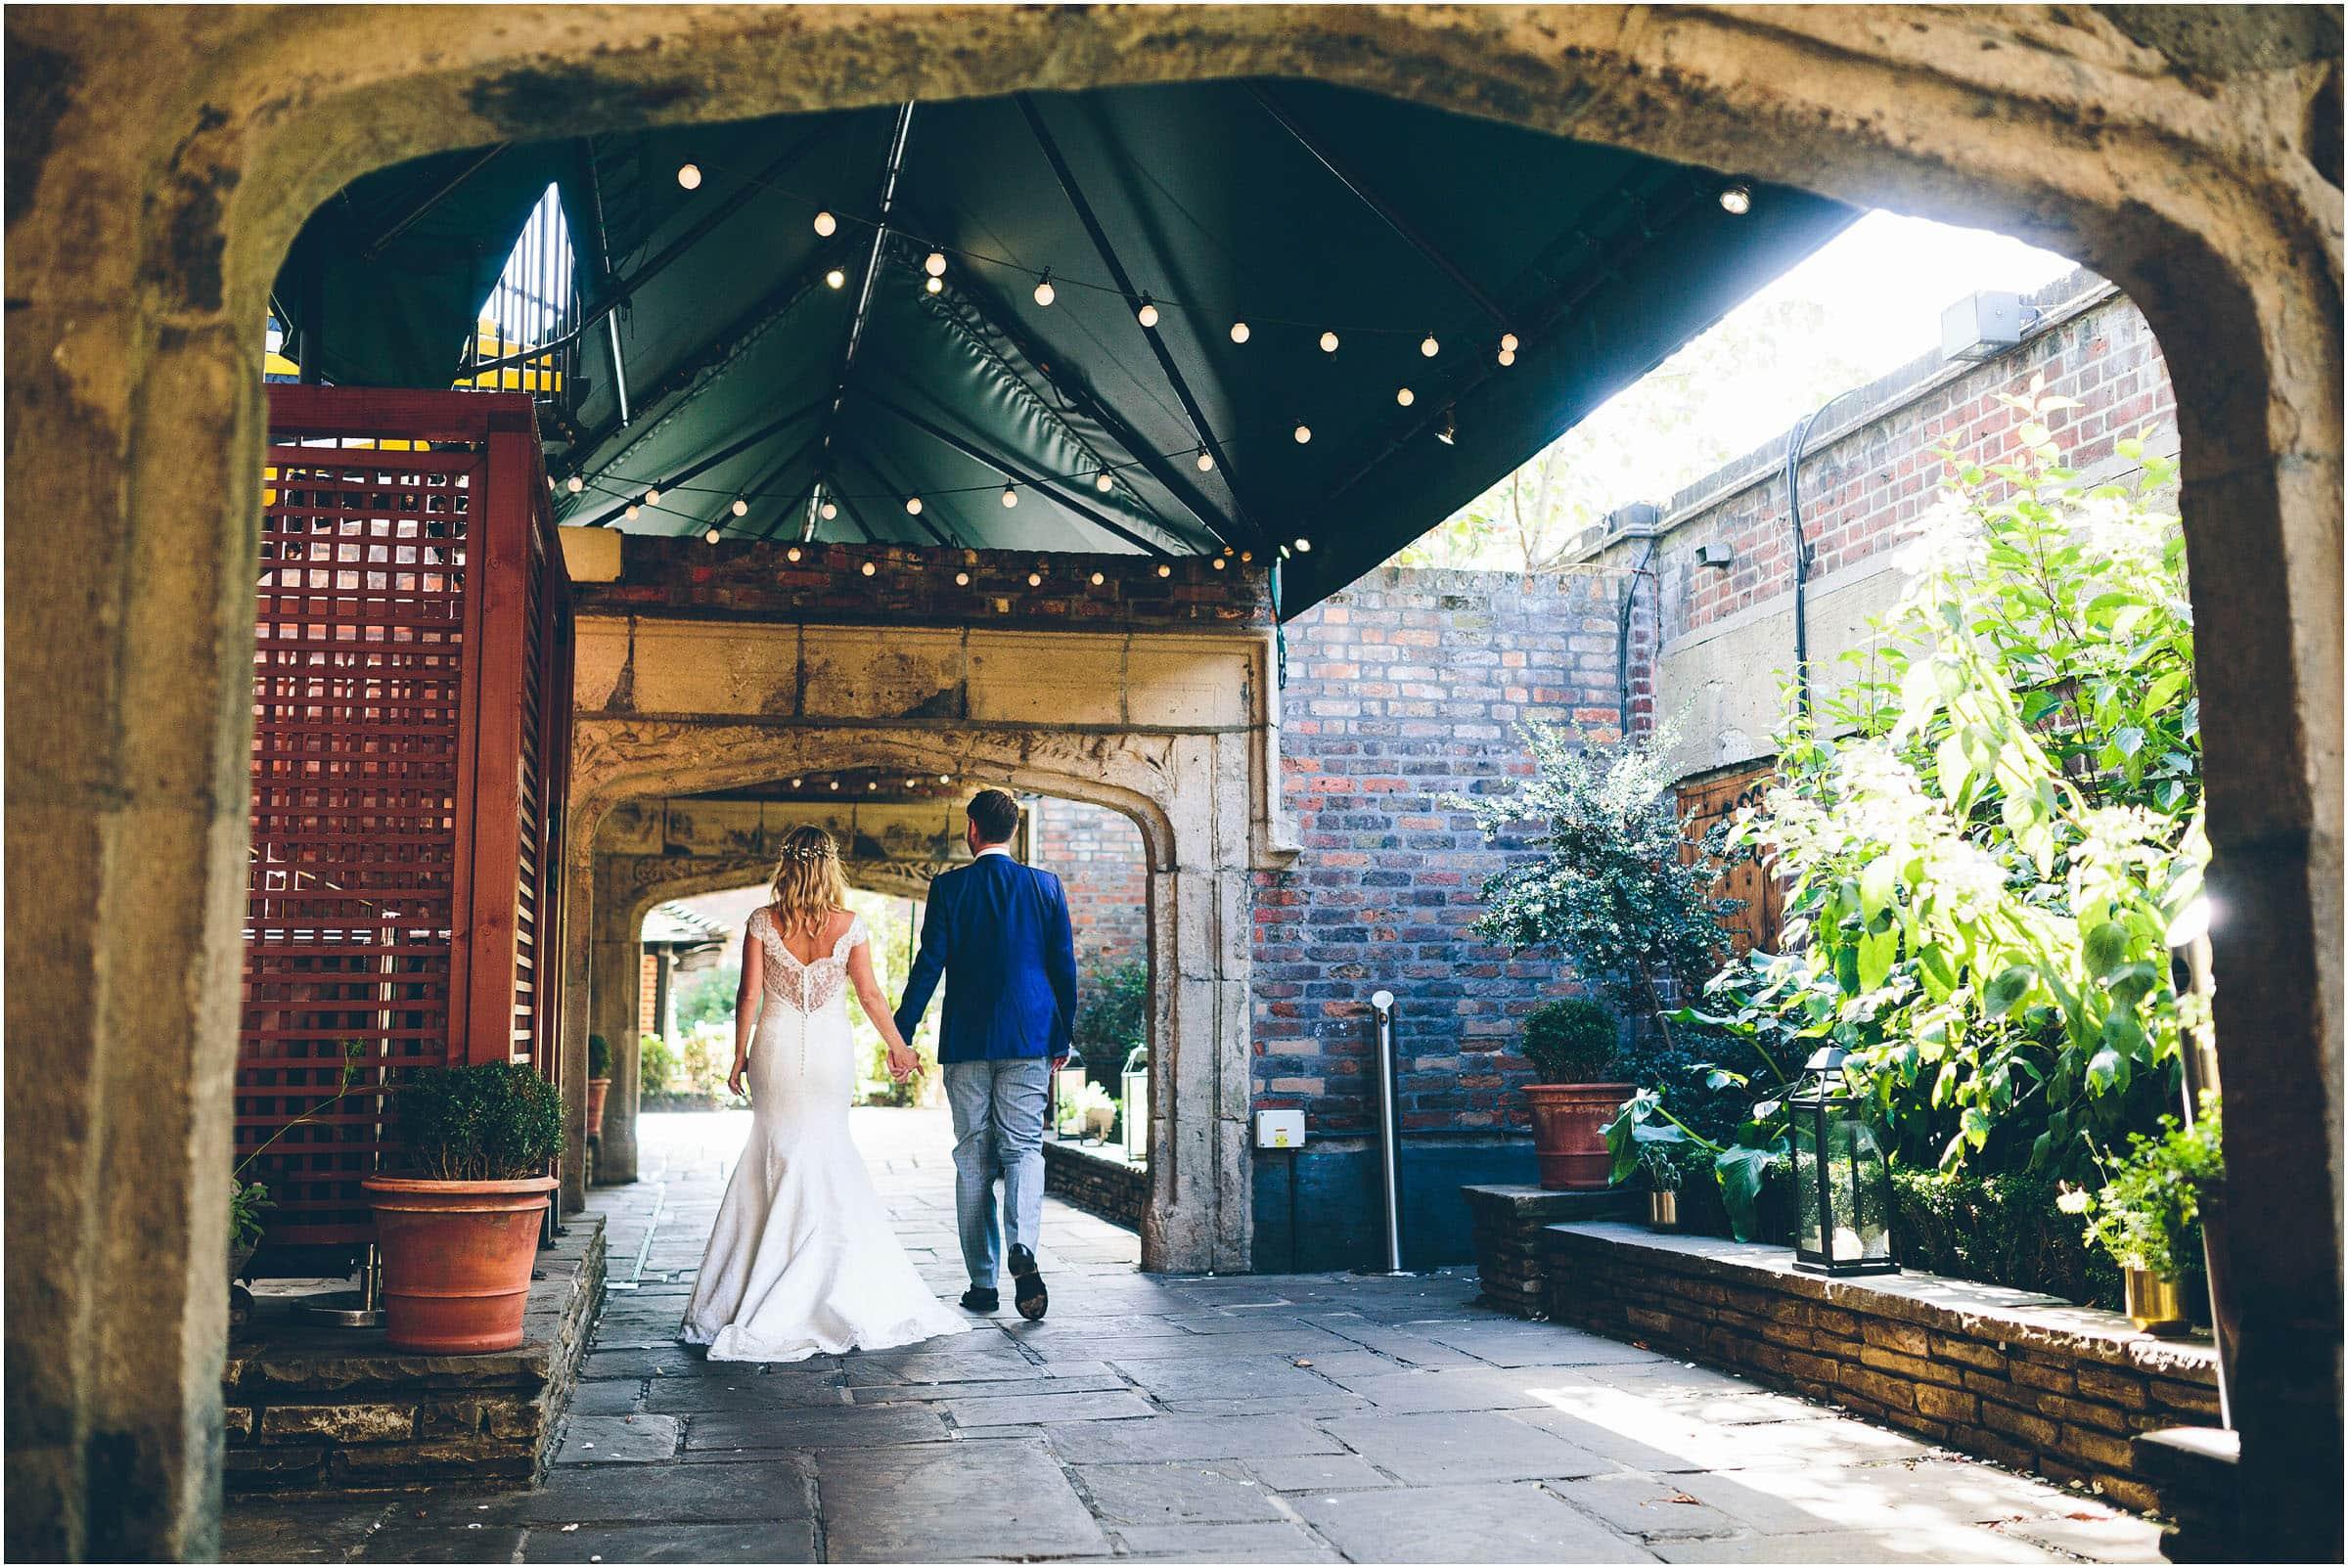 Kensington_Roof_Gardens_Wedding_Photography_0061